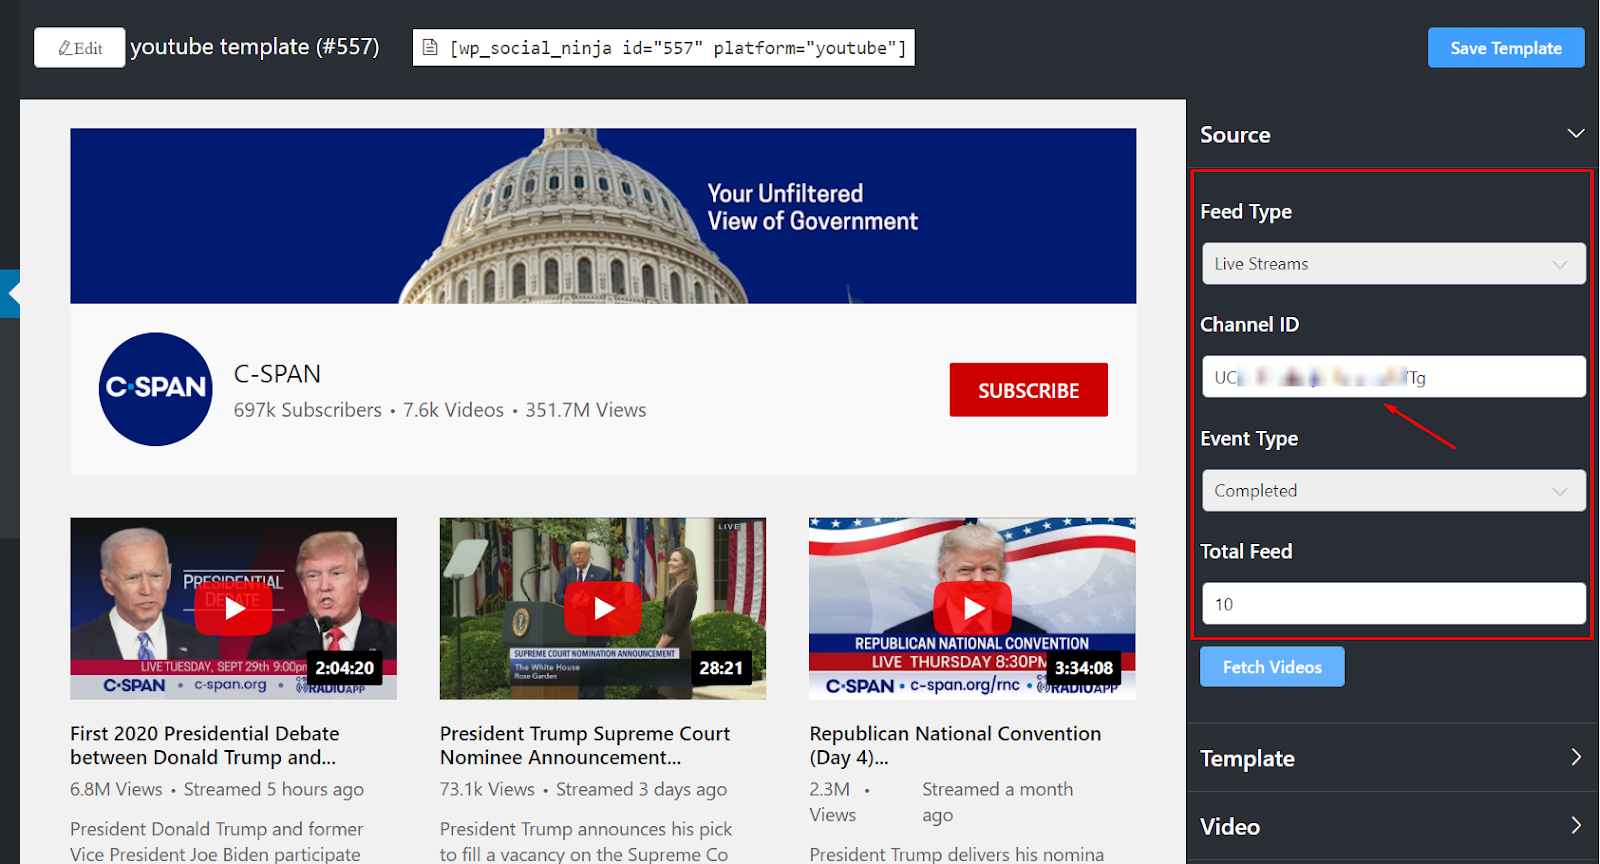 youtube live streams